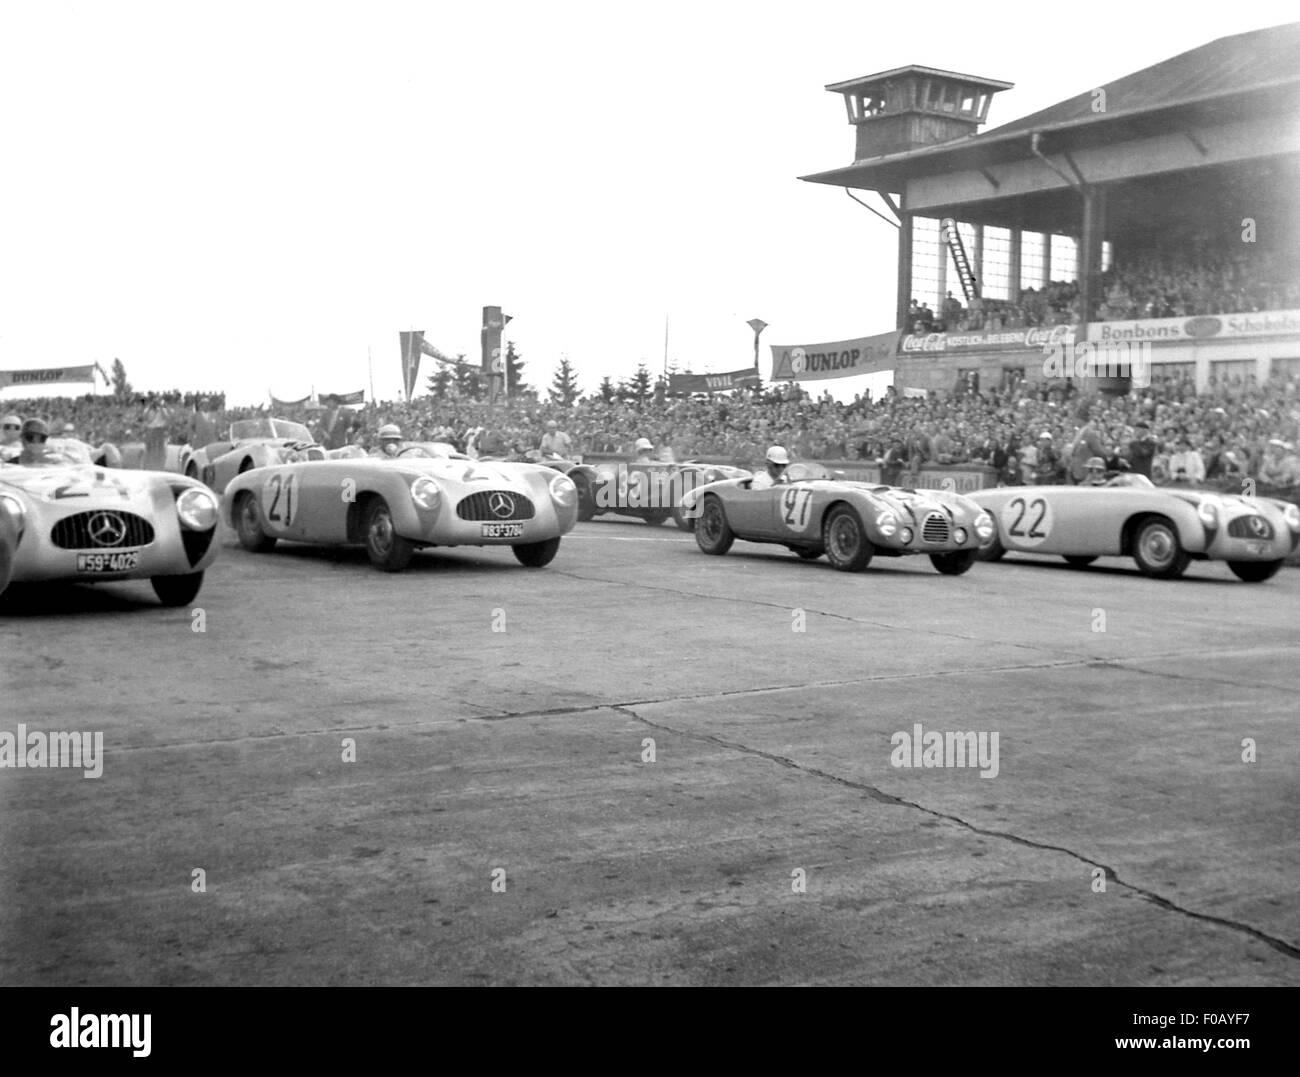 German GP in Berlin 1952 Stock Photo